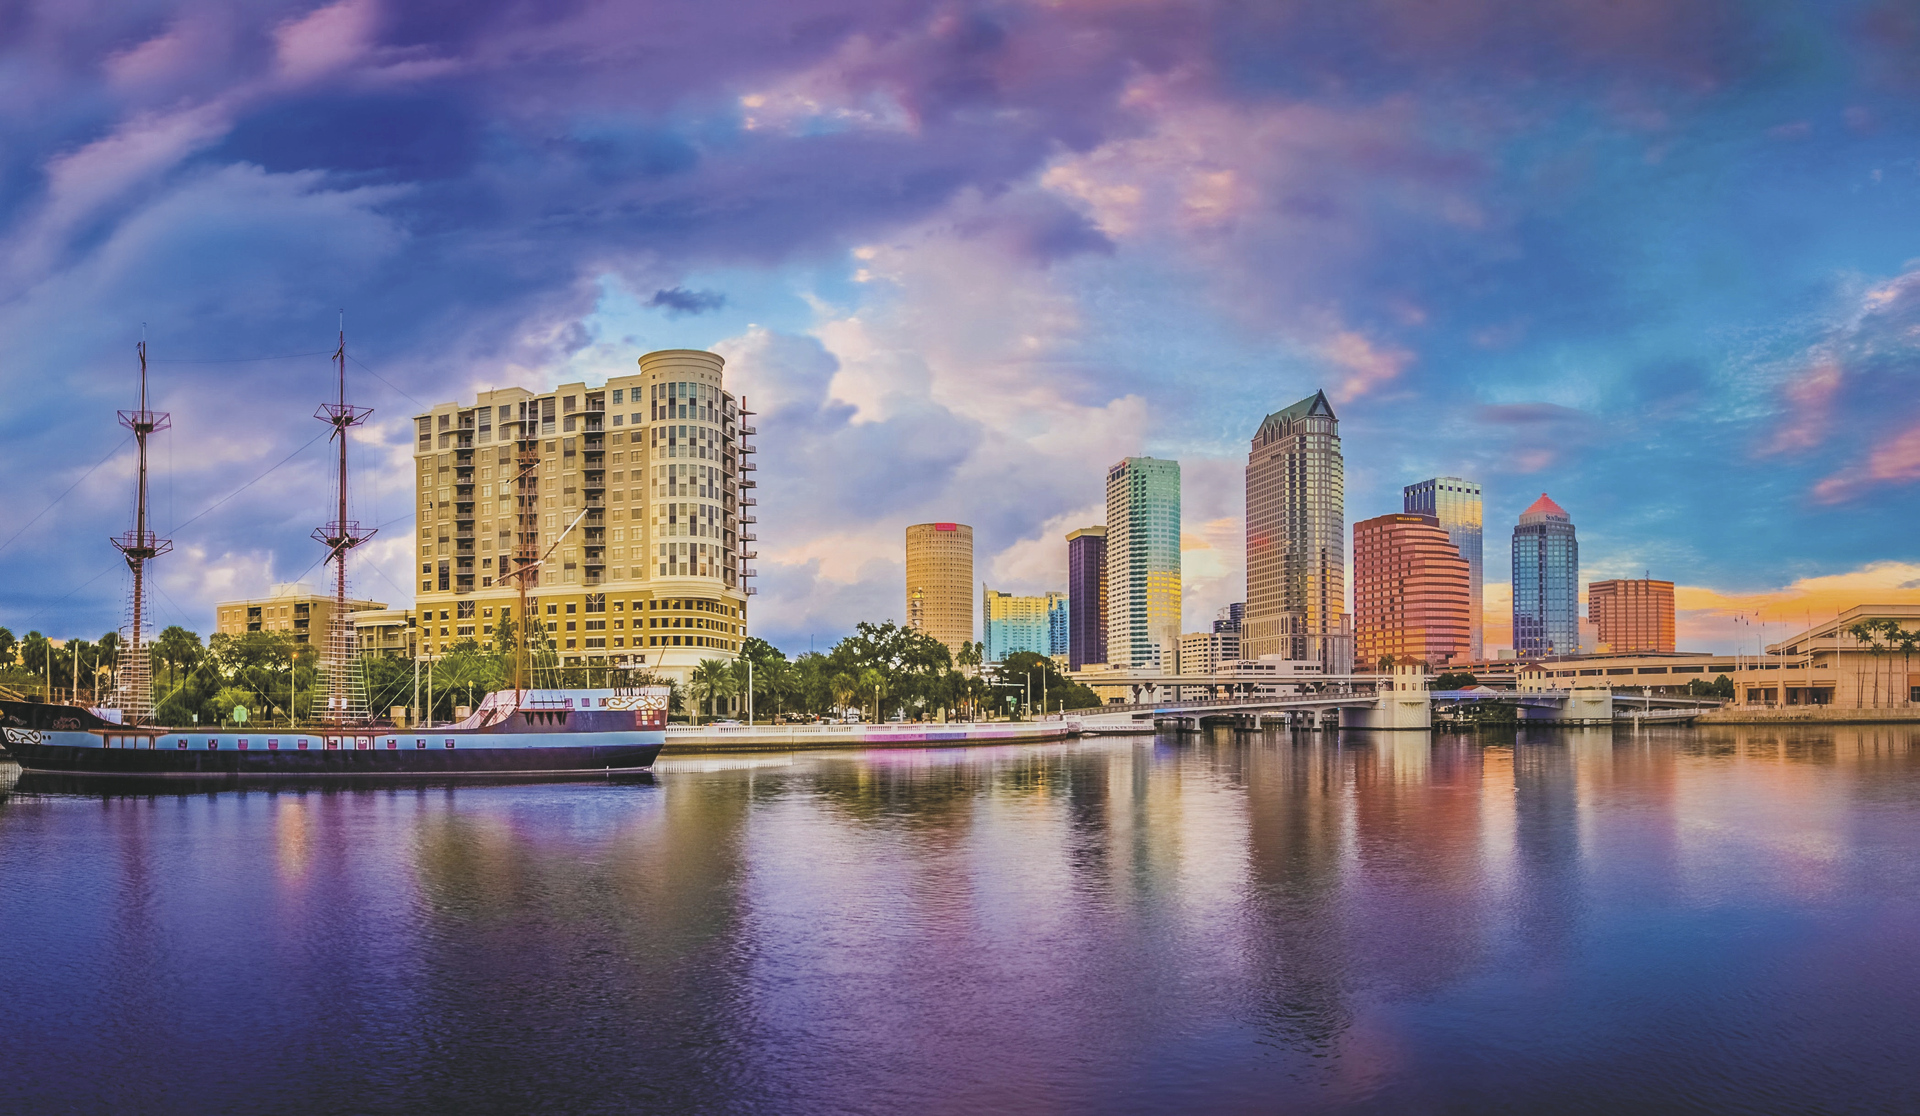 Skyline Tampa, ©JerryFergusonPhotography.com